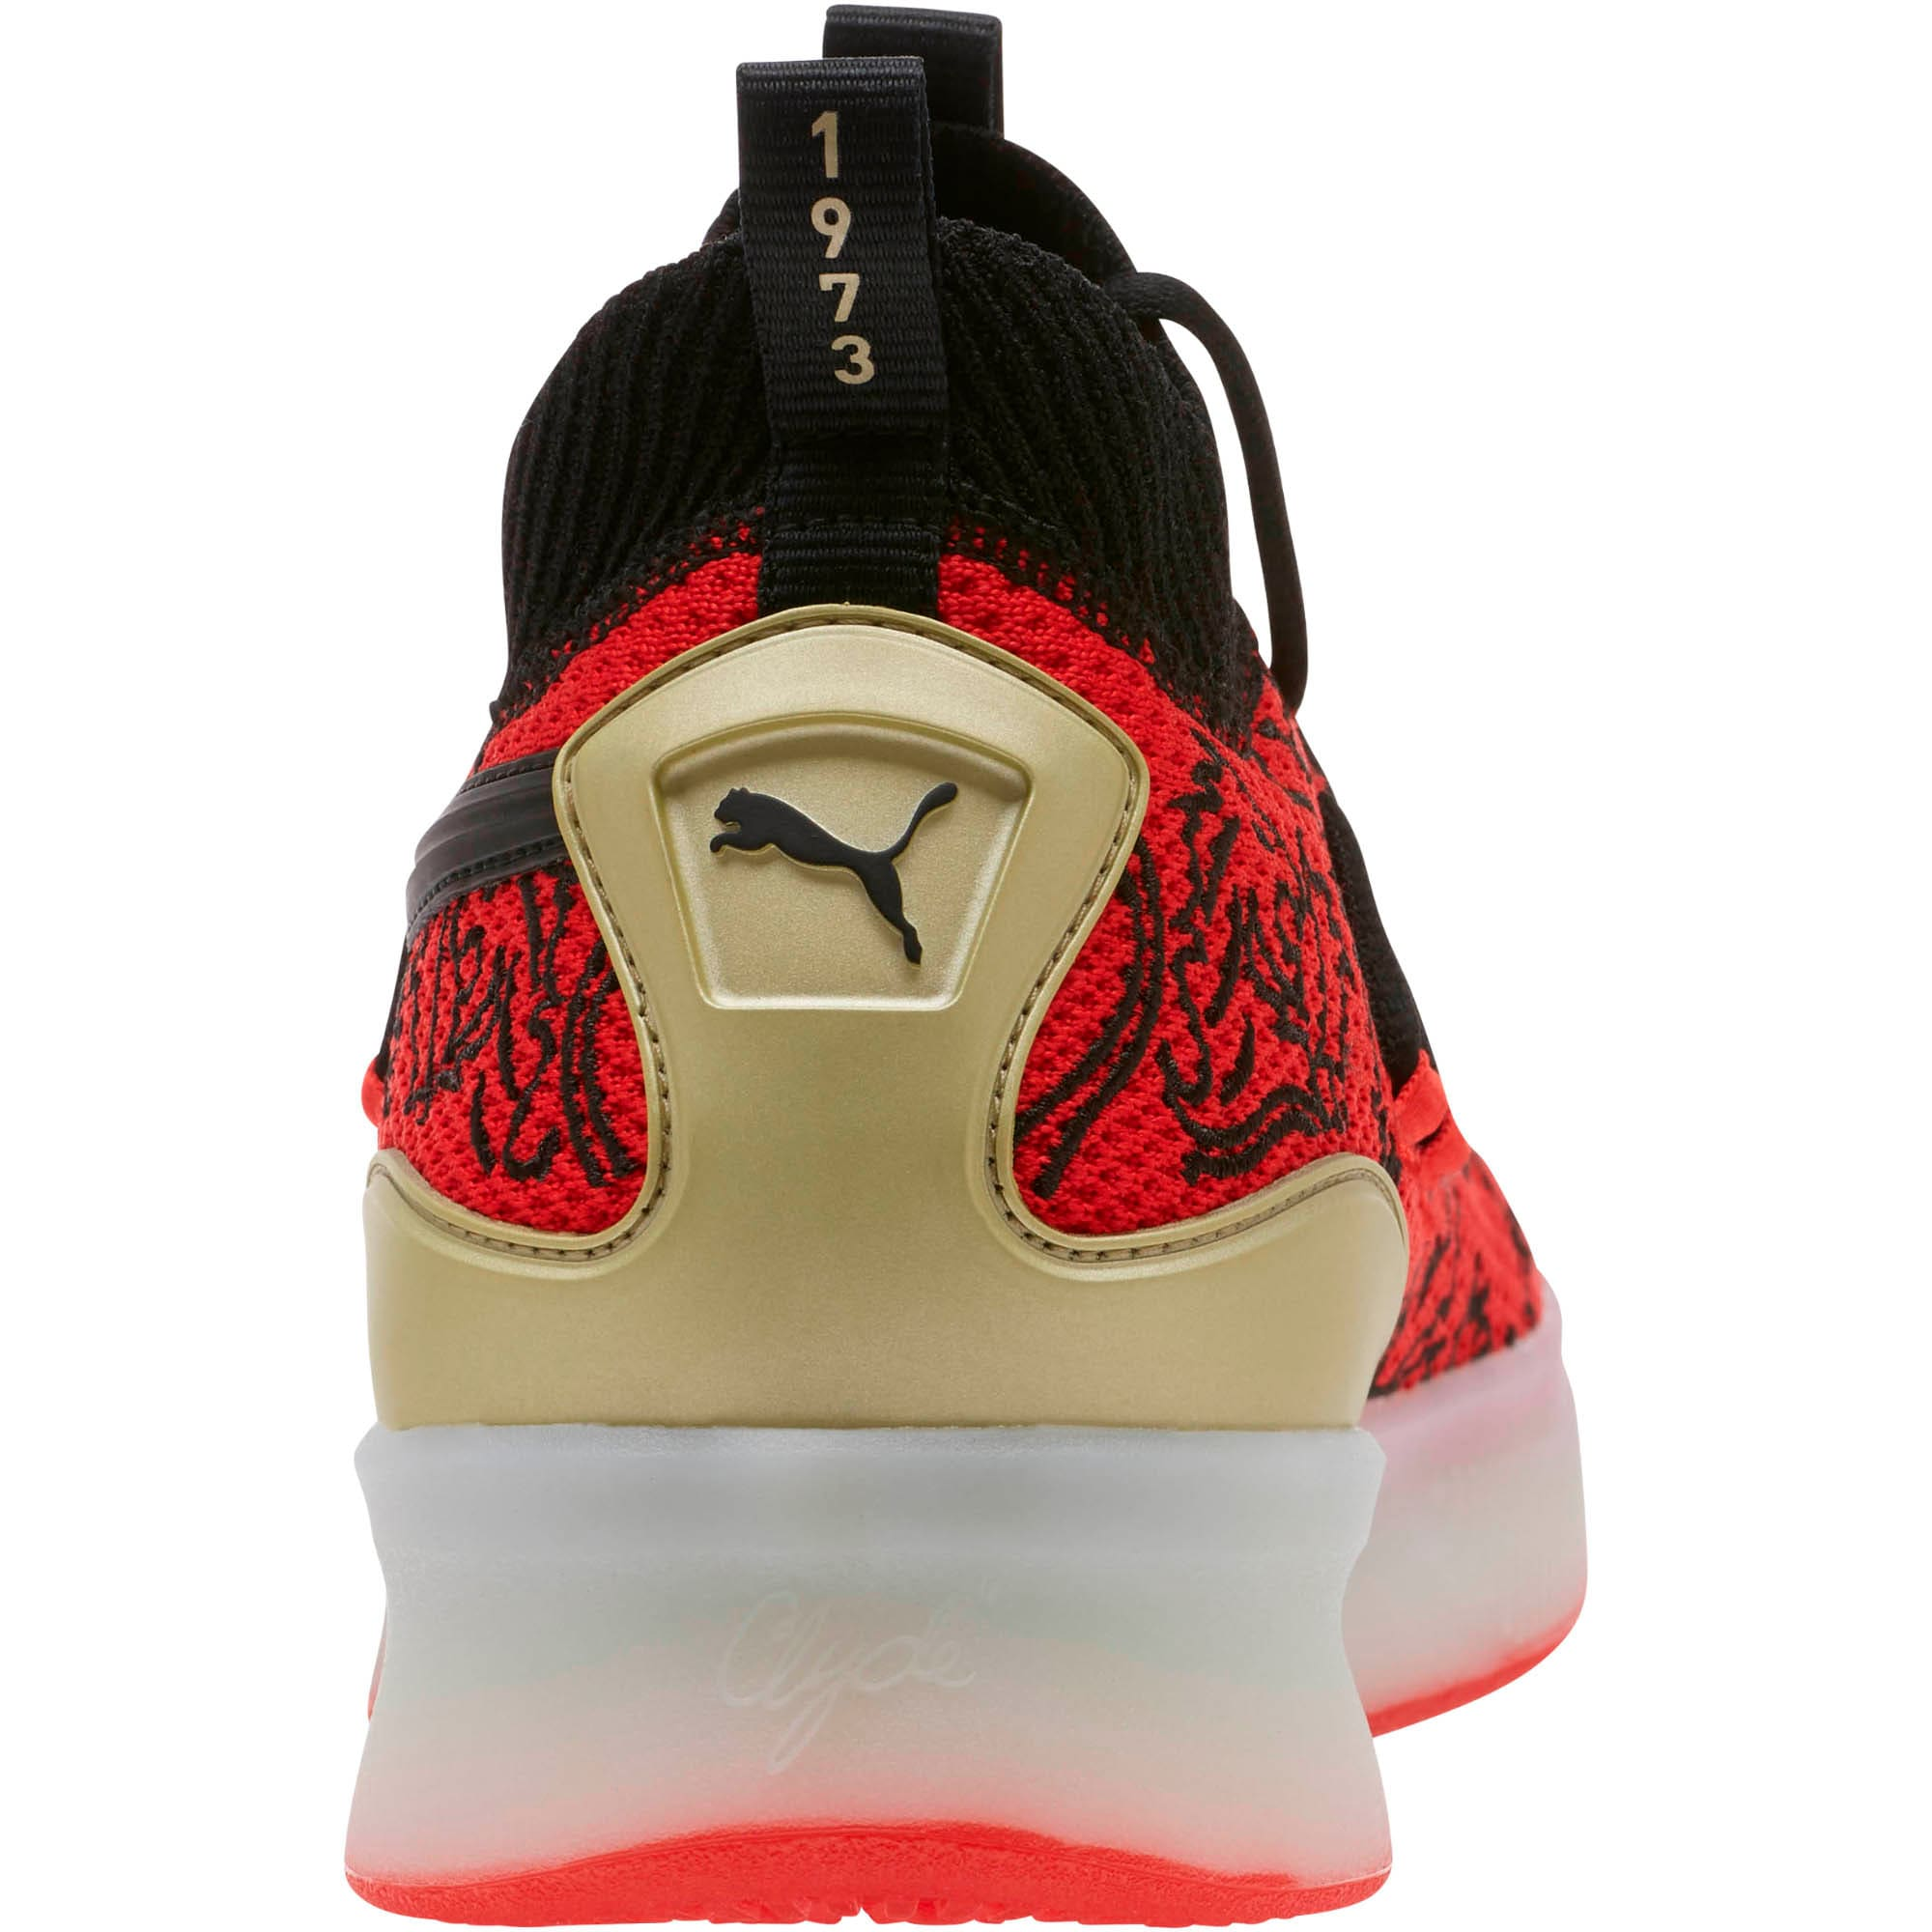 Imagen en miniatura 3 de Zapatillas de baloncesto de hombre Clyde Court London, High Risk Red-Puma Black, mediana